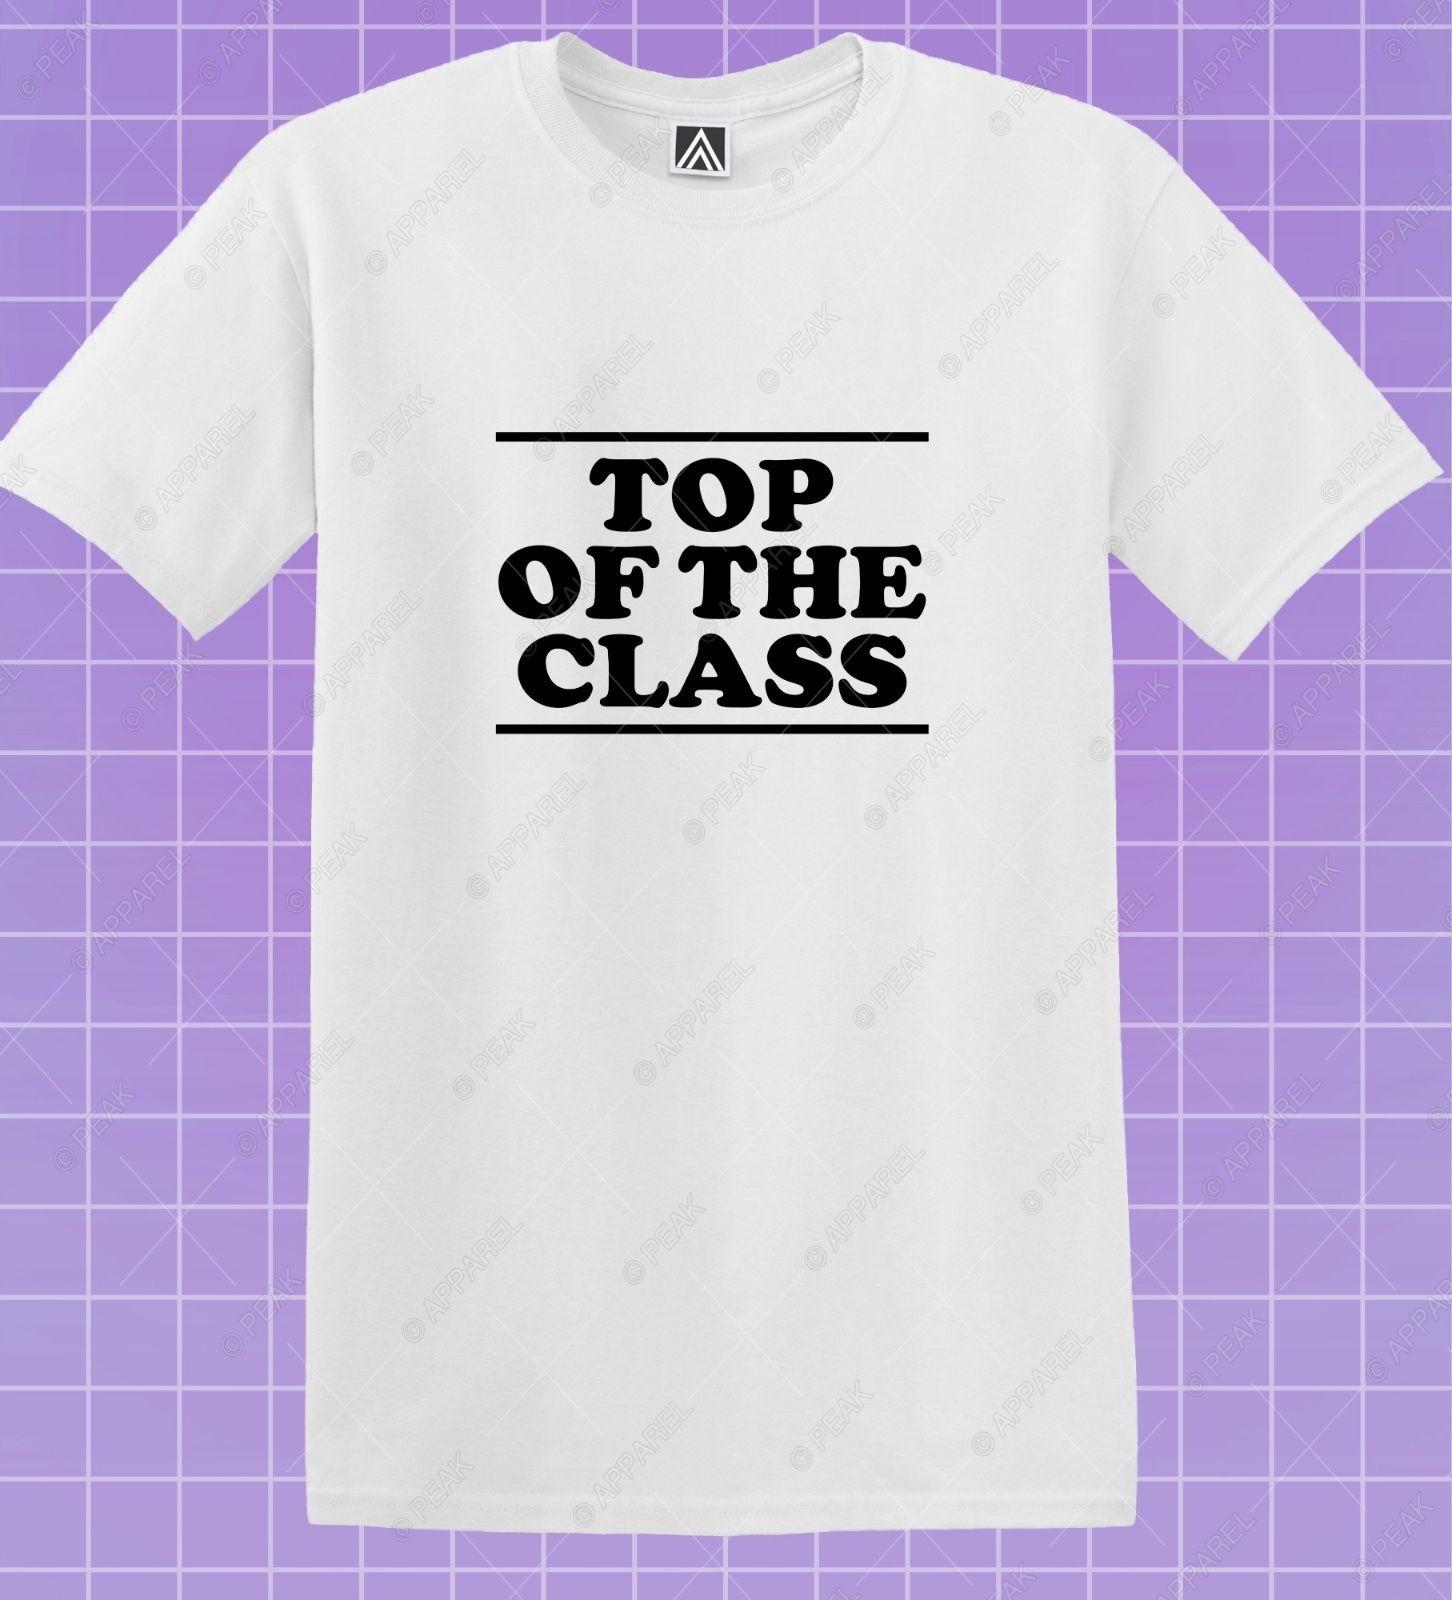 Top Of The Class T Shirt Lgbt Pride Mcr Tee Gay Sexy Fun Parade Love